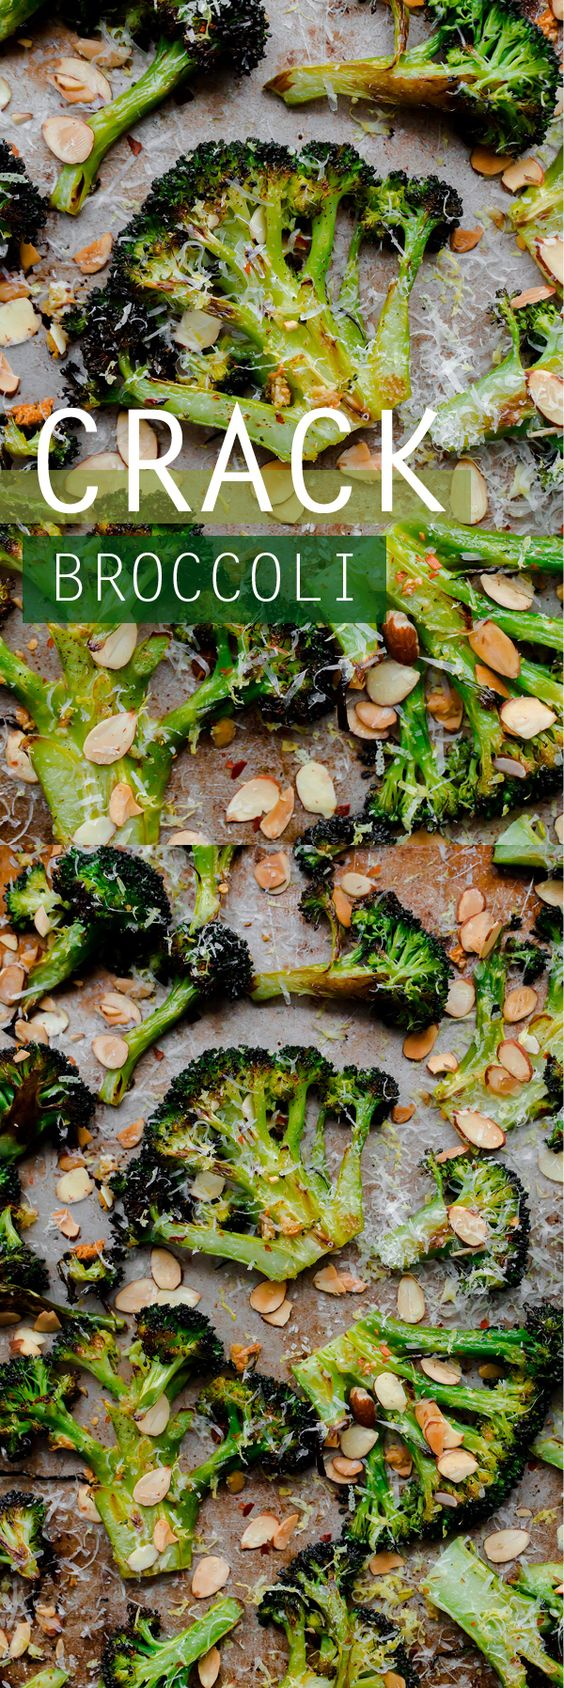 Crack Broccoli.